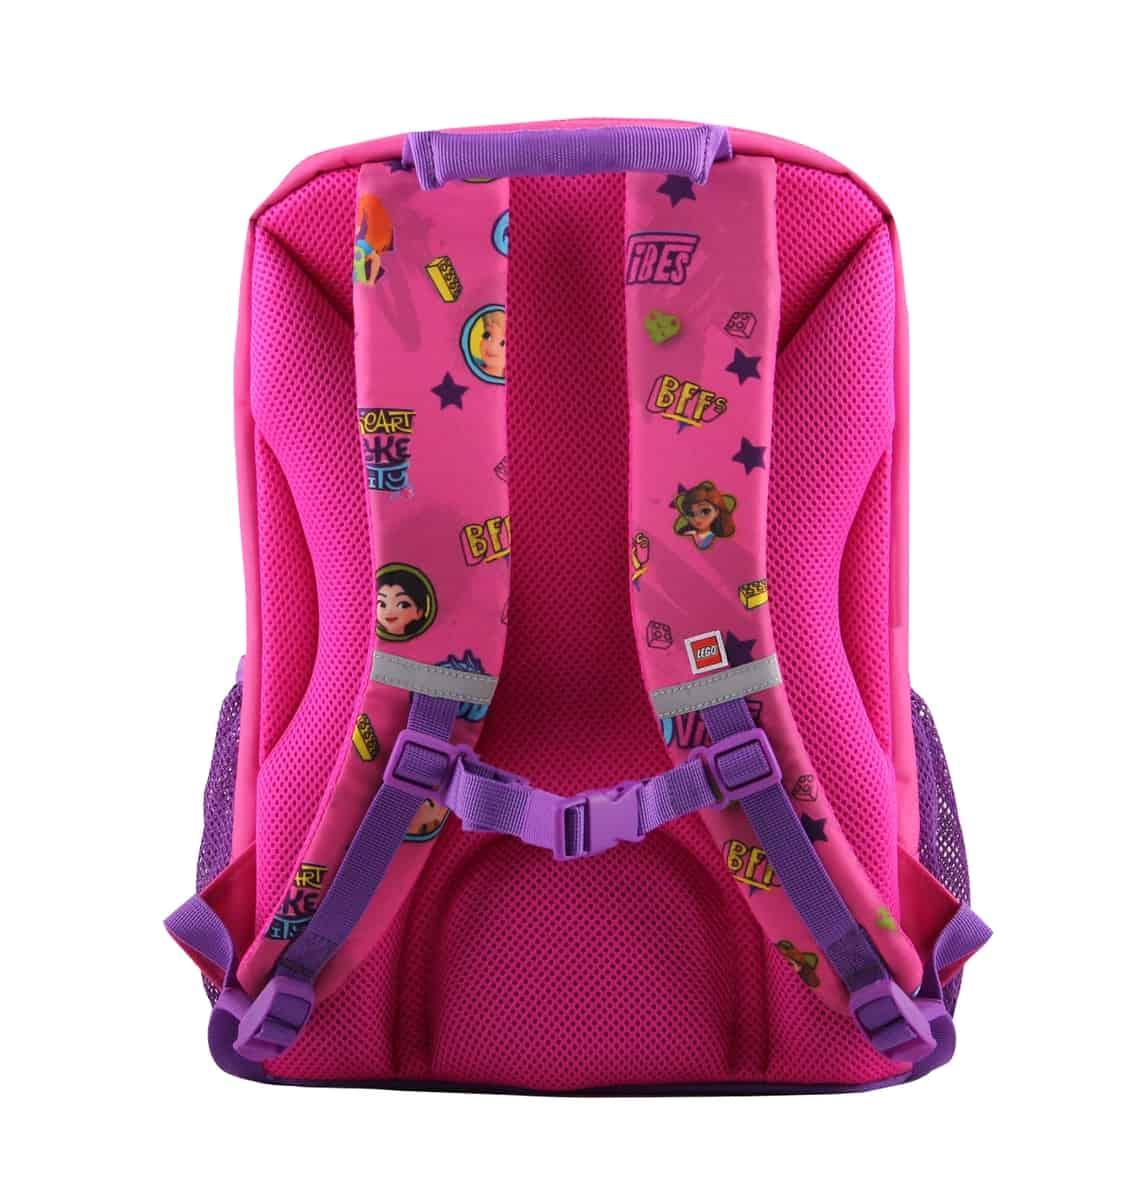 lego 5005919 friends belight rucksack